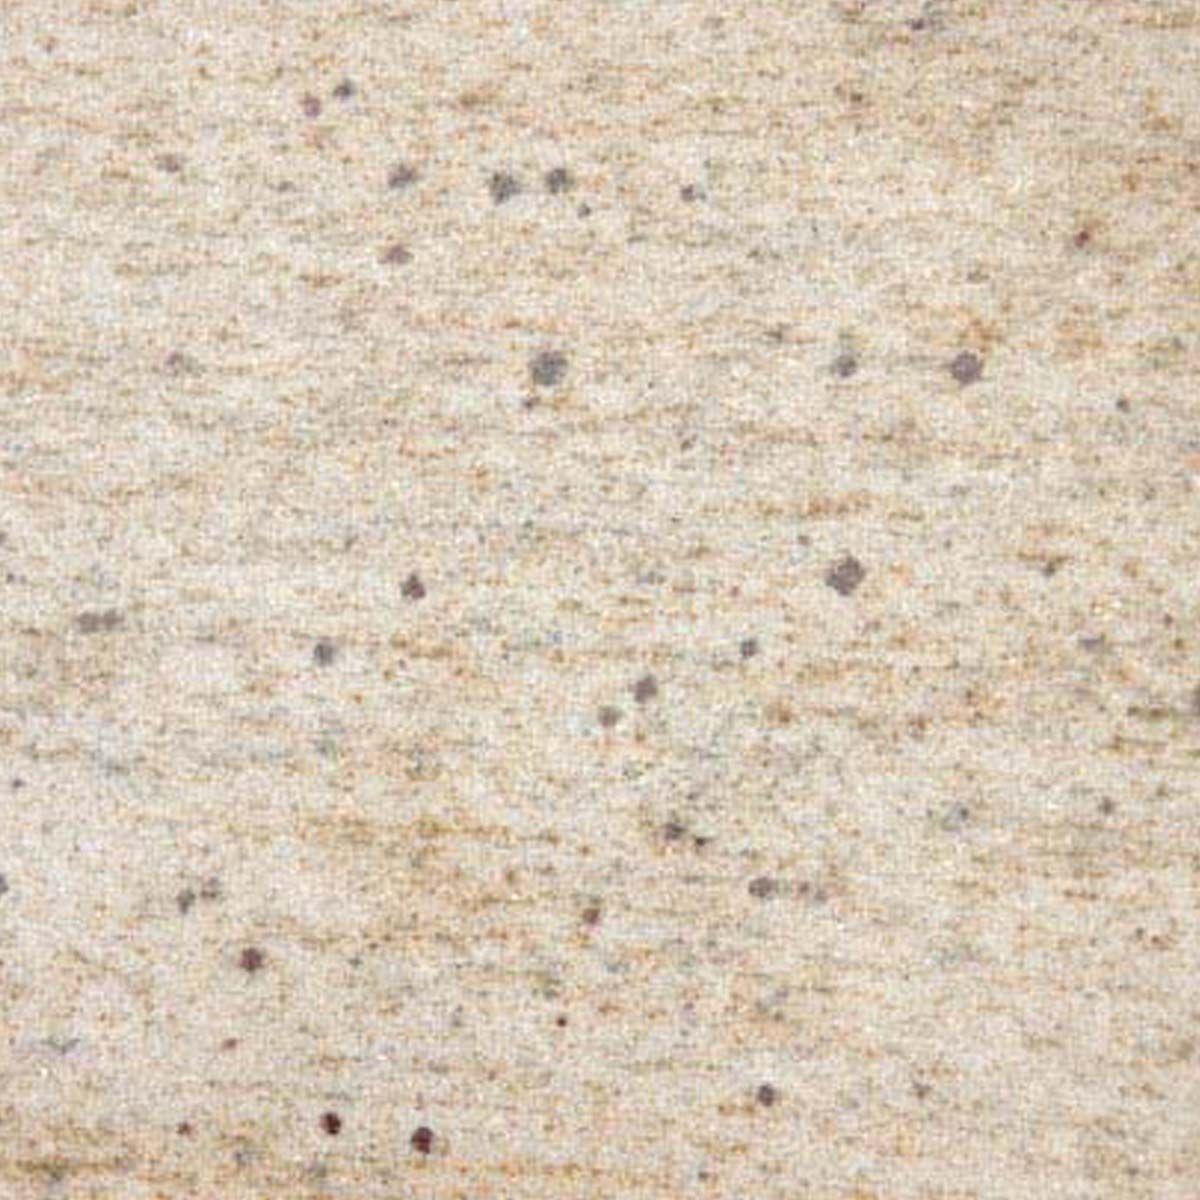 Kashmir Gold Granite Tile, Slabs U0026 Prefabricated Countertops